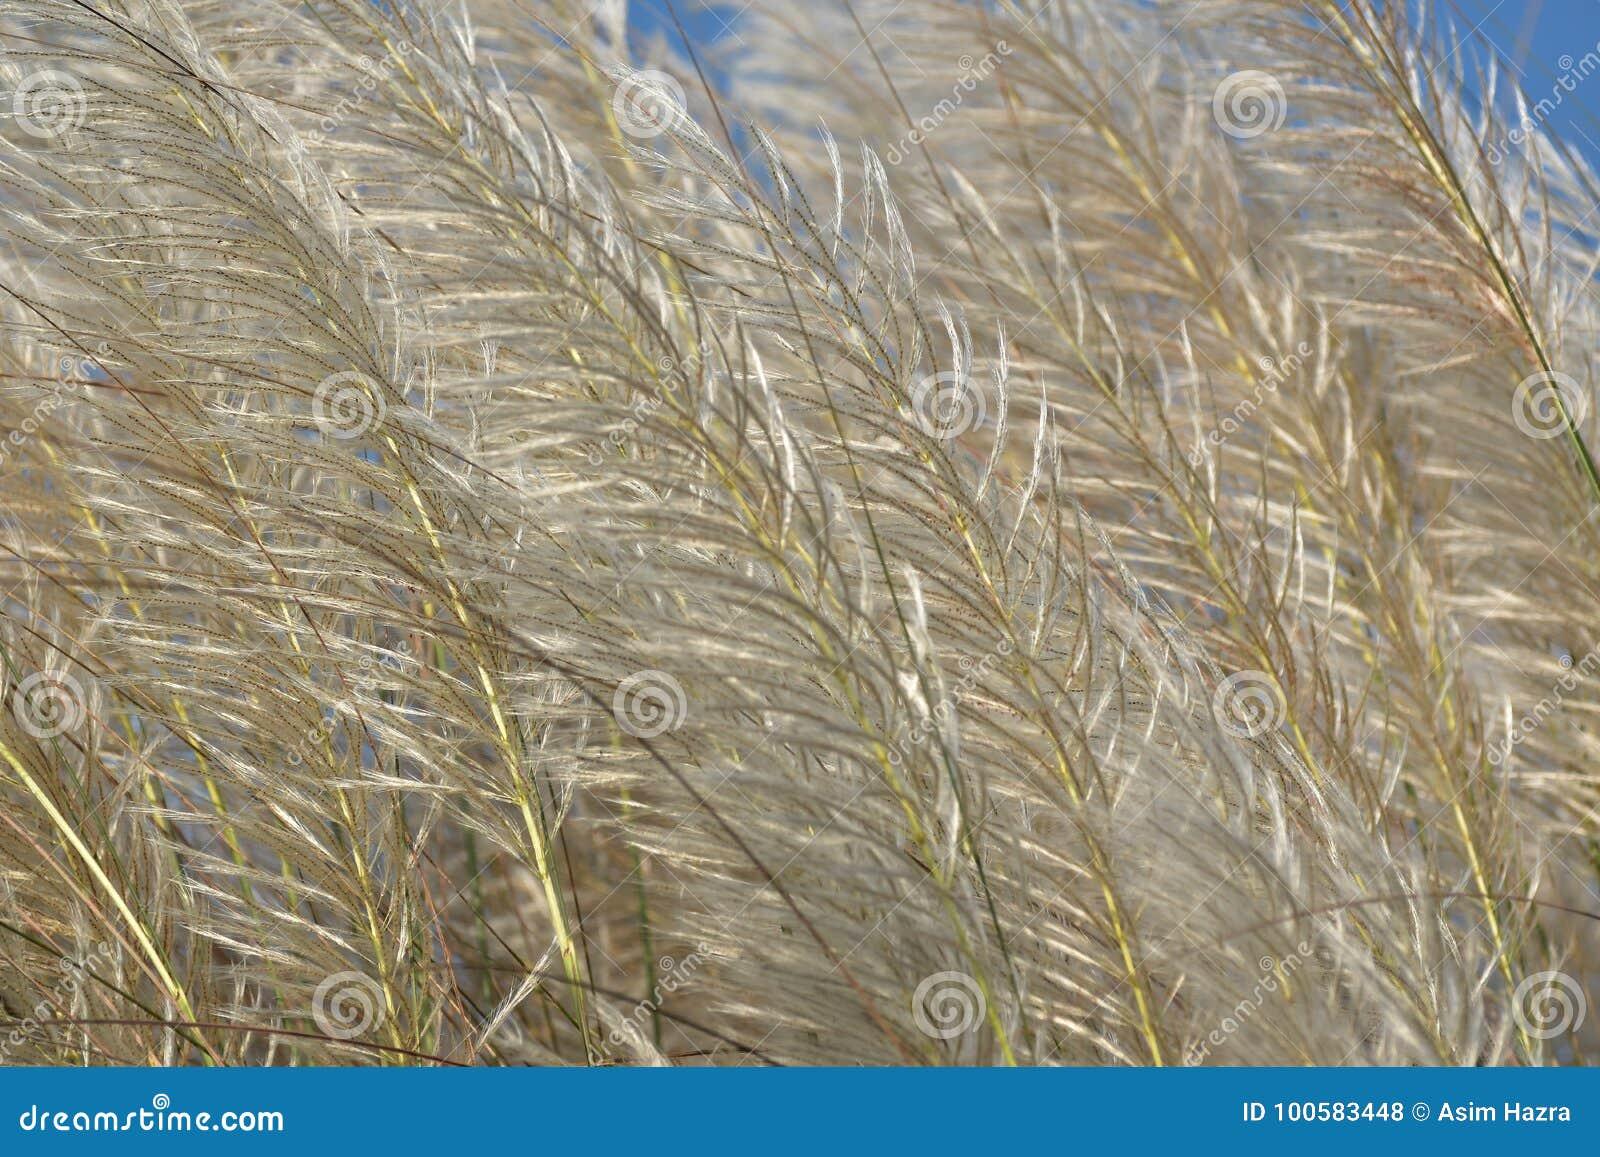 wild grass texture. Download Wild Grass Flower Texture Stock Photo. Image Of - 100583448 Wild E